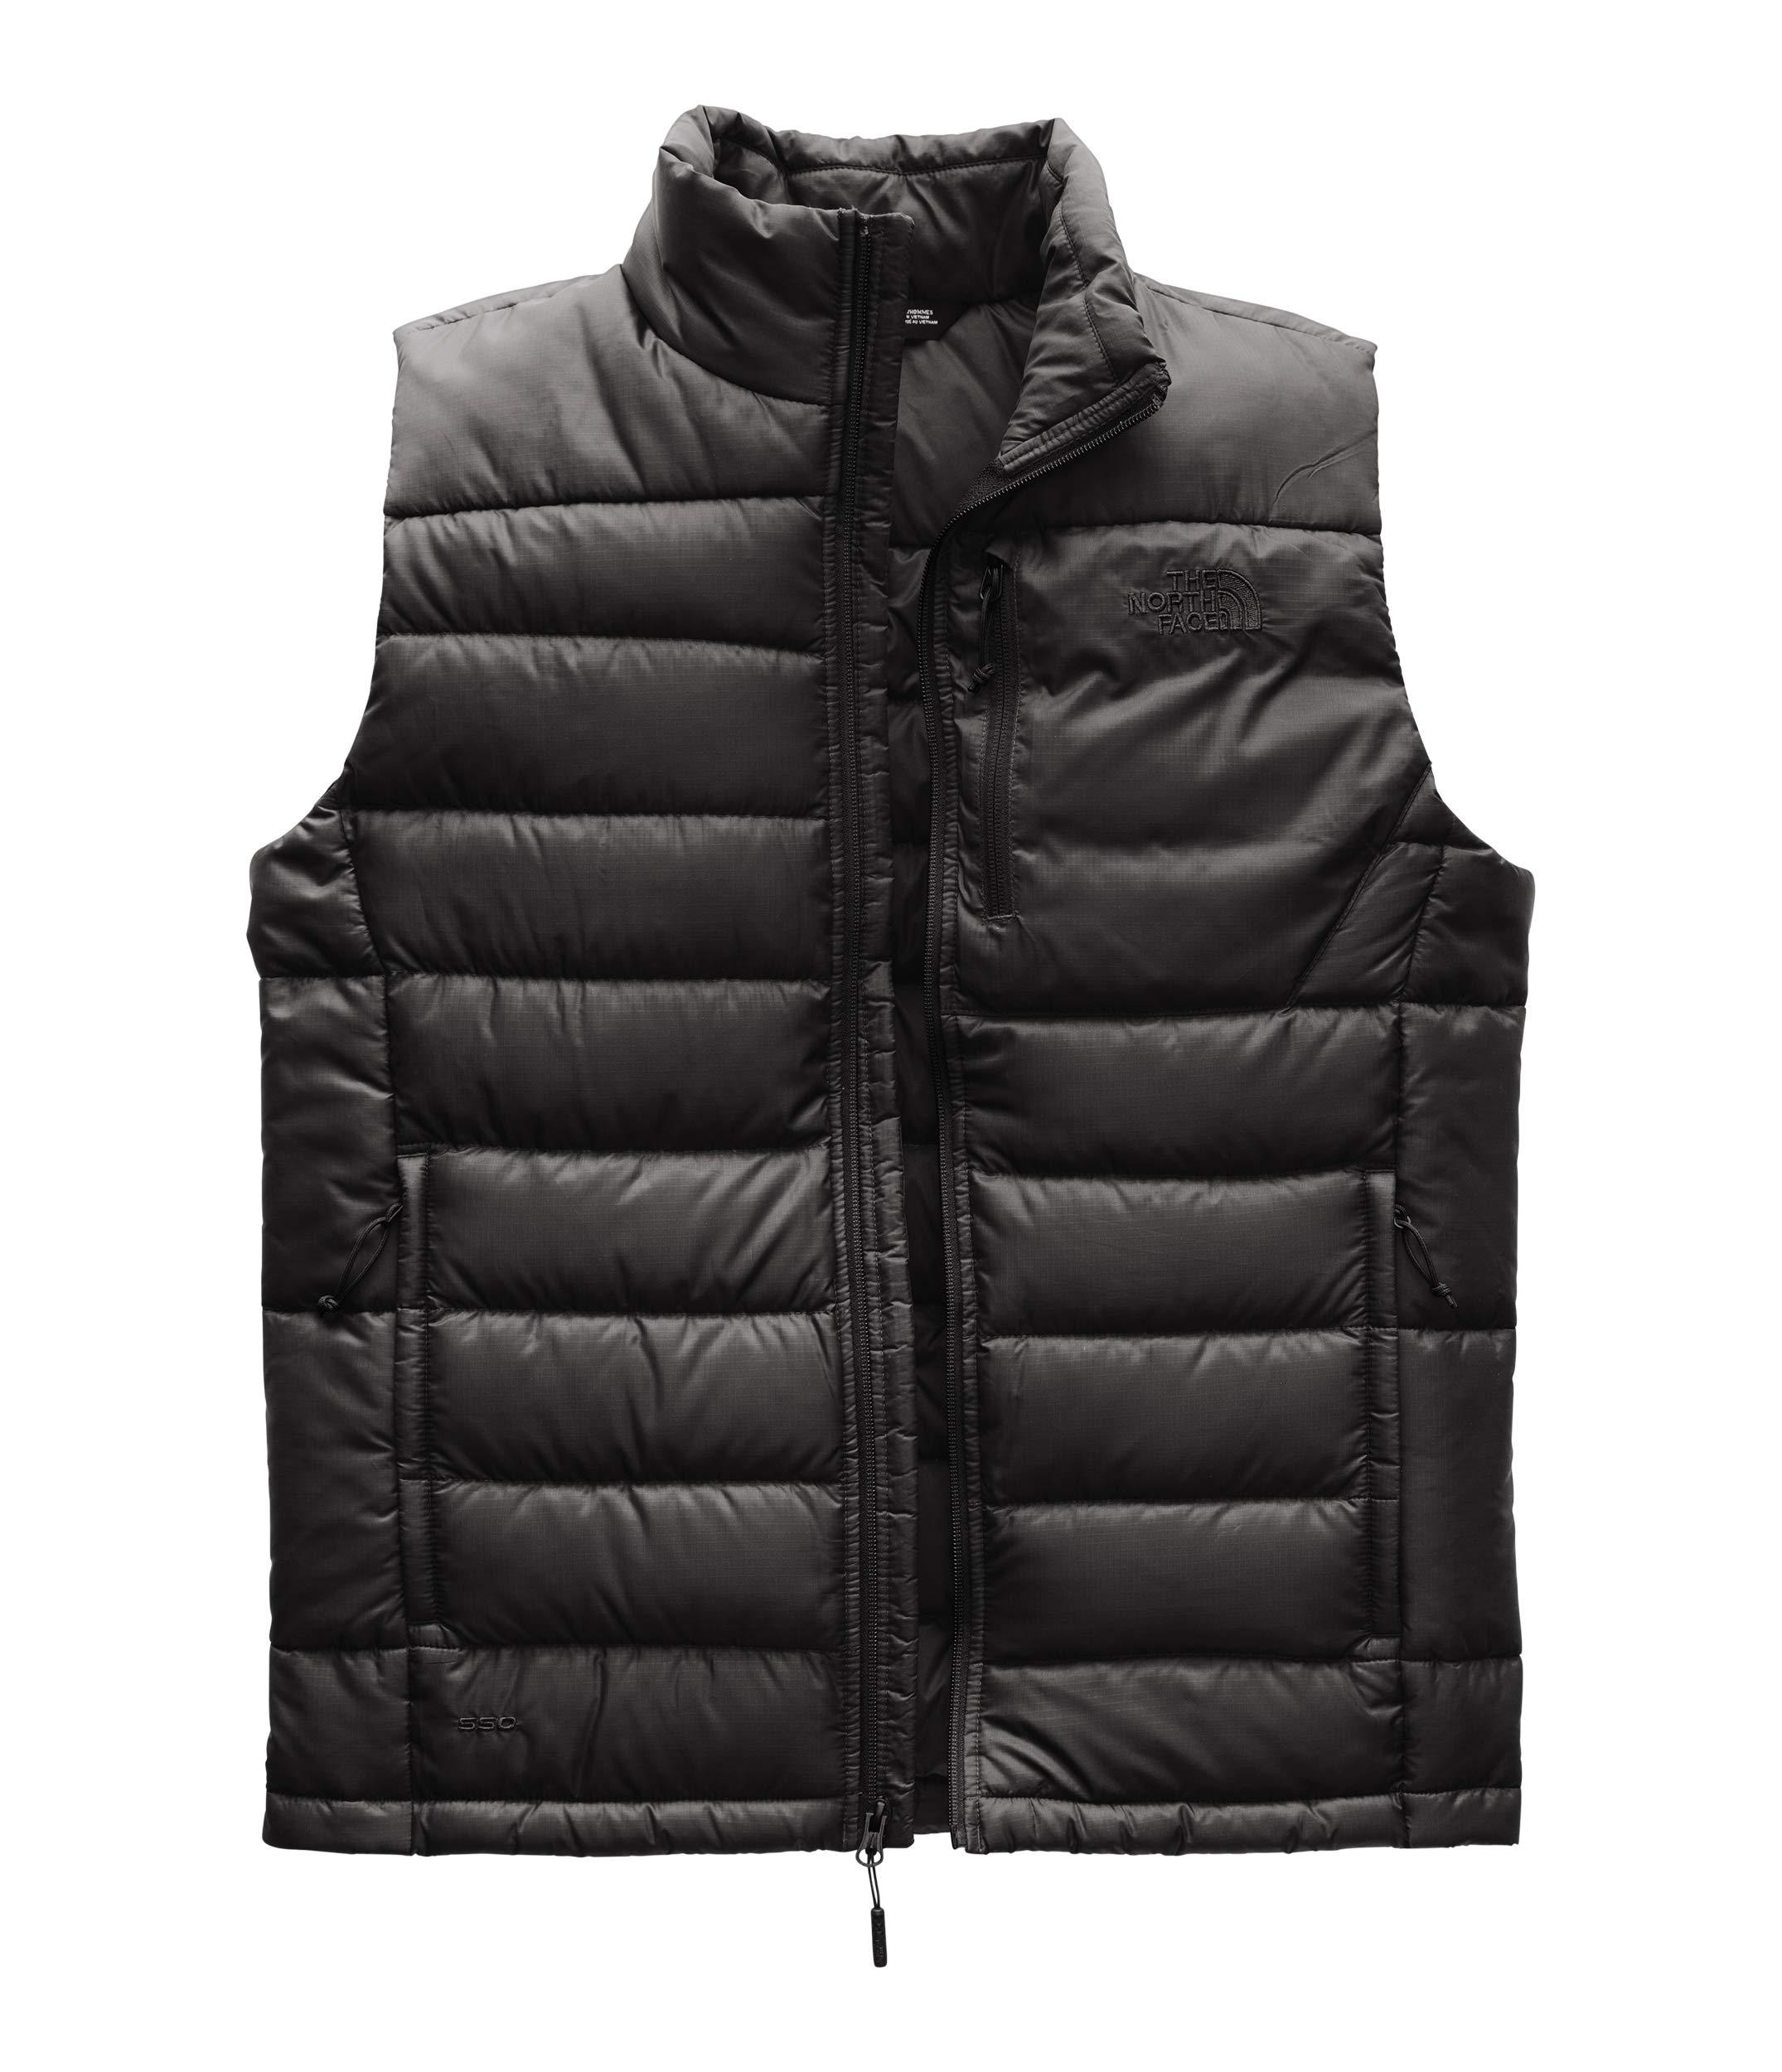 The North Face Men's Aconcagua Vest - Asphalt Grey - L by The North Face